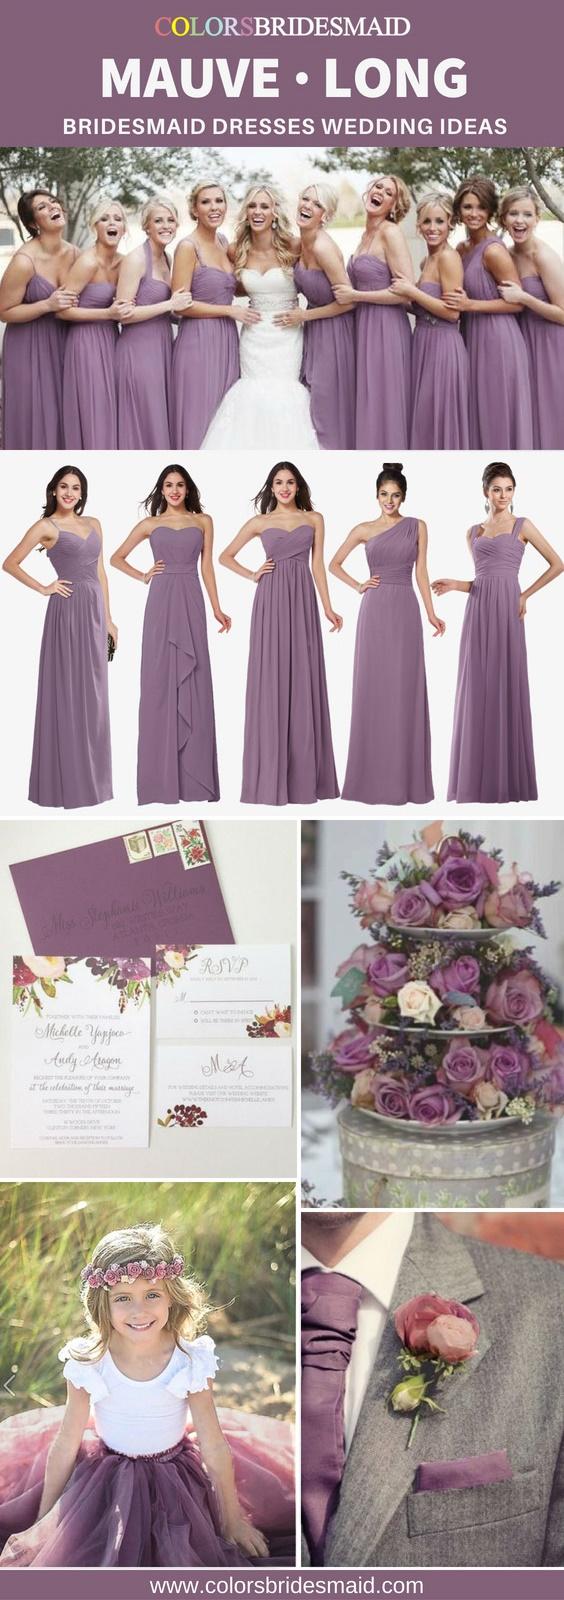 mauve long bridesmaid dresses